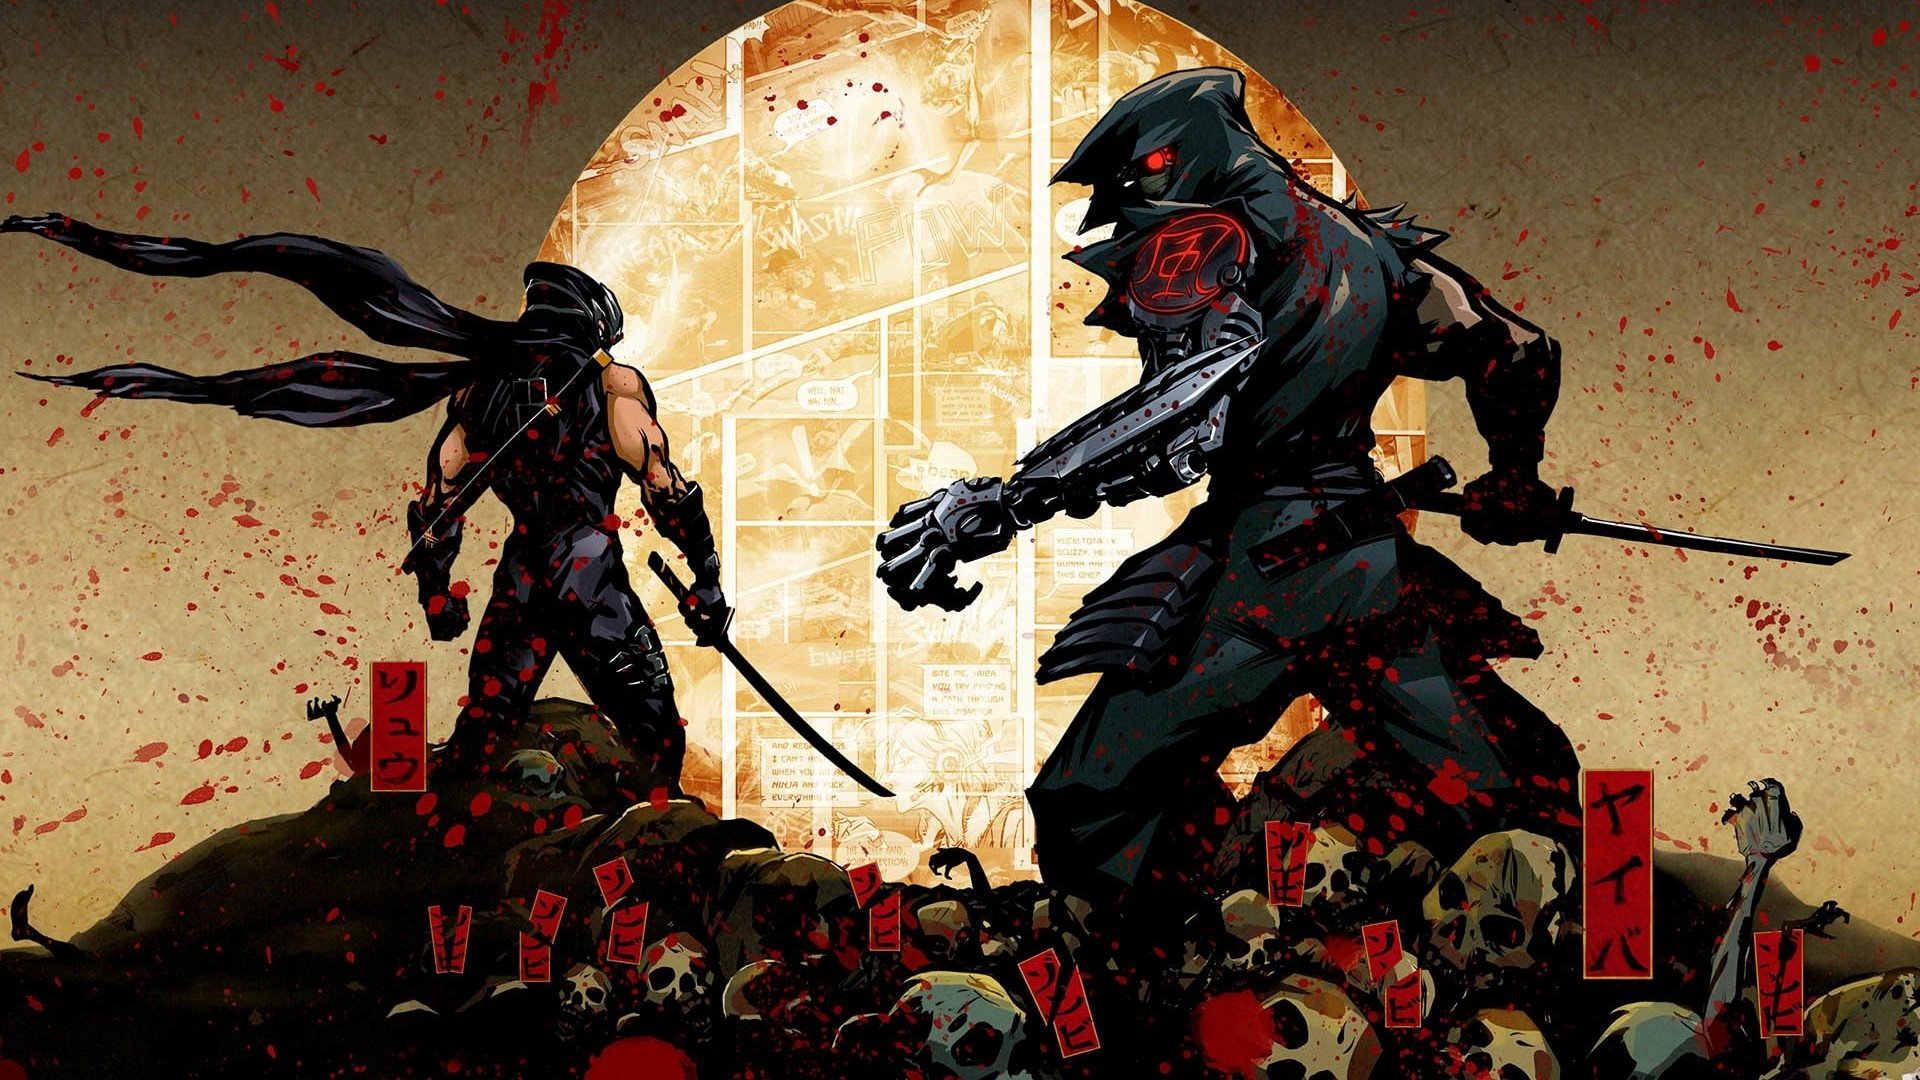 Game Ninja Gaiden Wallpaper: Yaiba: Ninja Gaiden Z HD Wallpaper